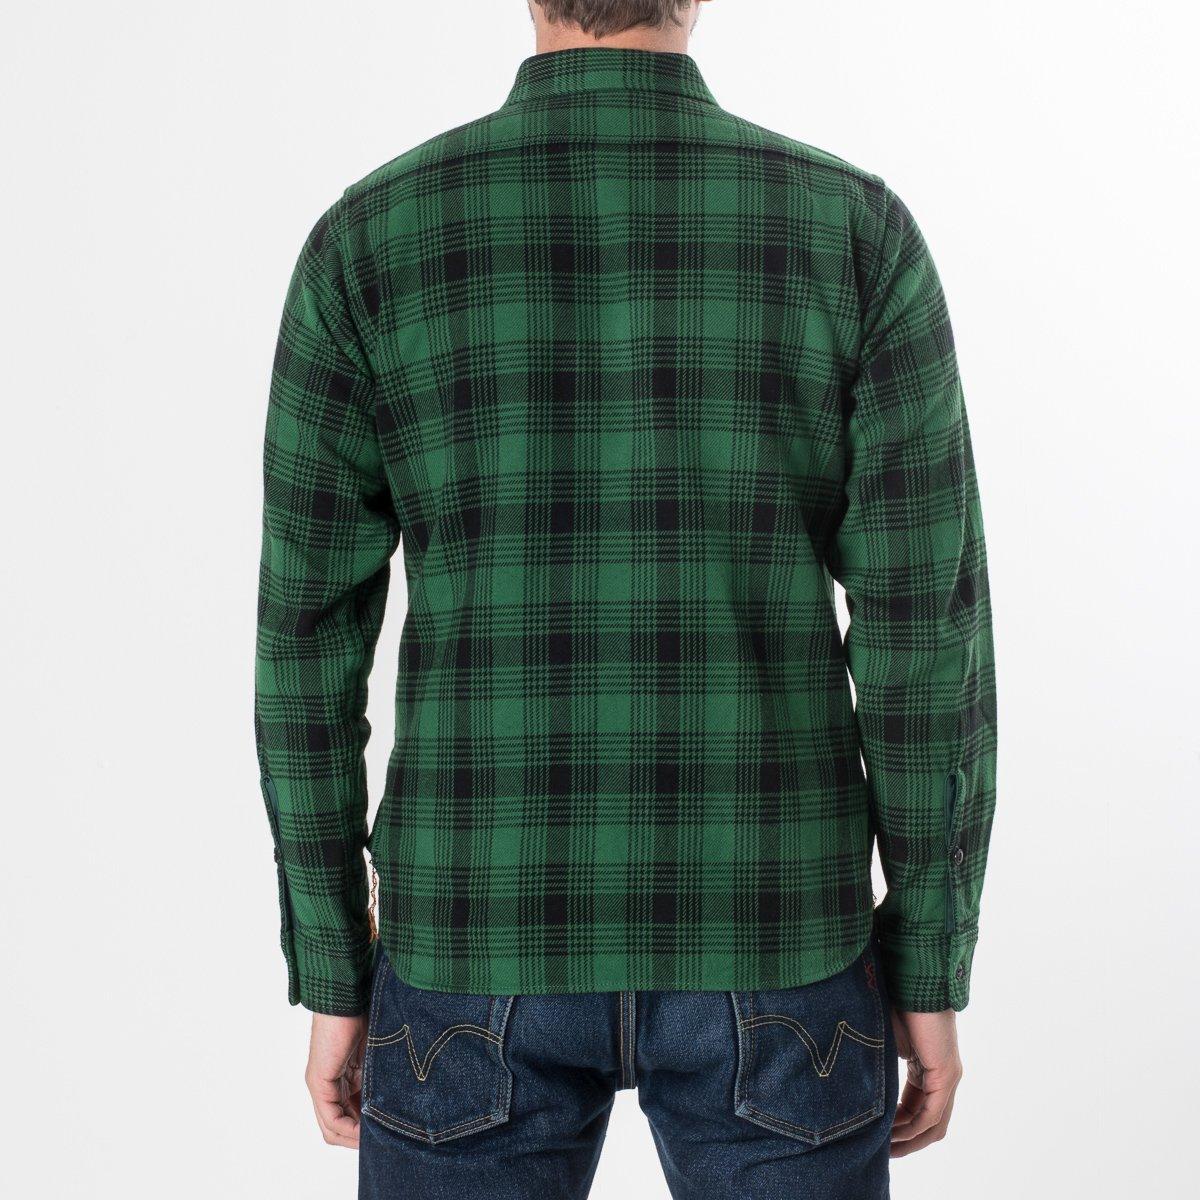 a70d236a1 IHSH-190-GRN | Iron Heart Ultra Heavy Japanese Cotton Flannel Green ...